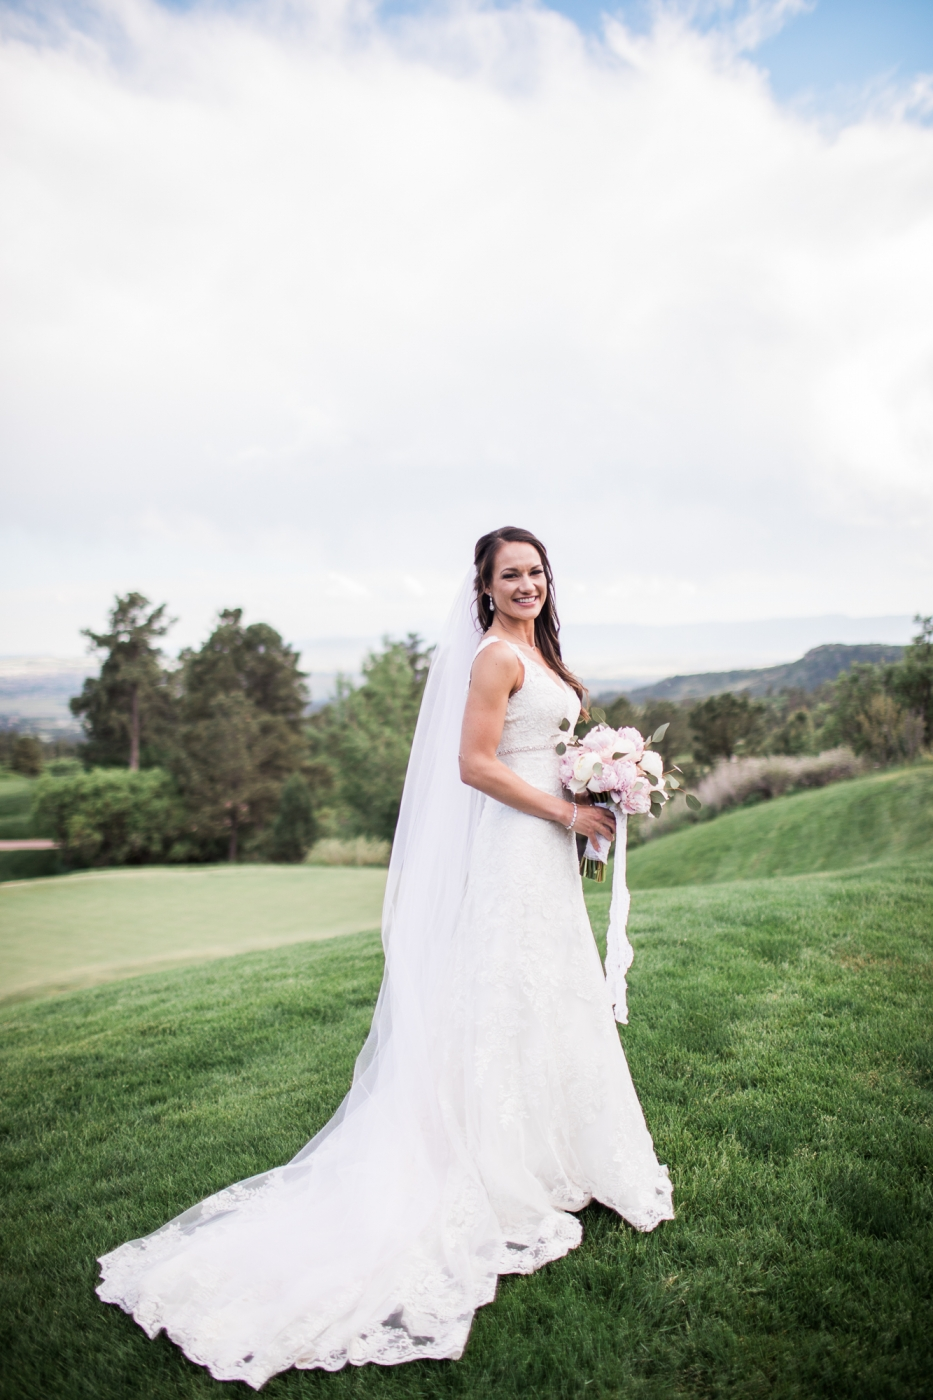 Sara | Hazel and Lace Photography